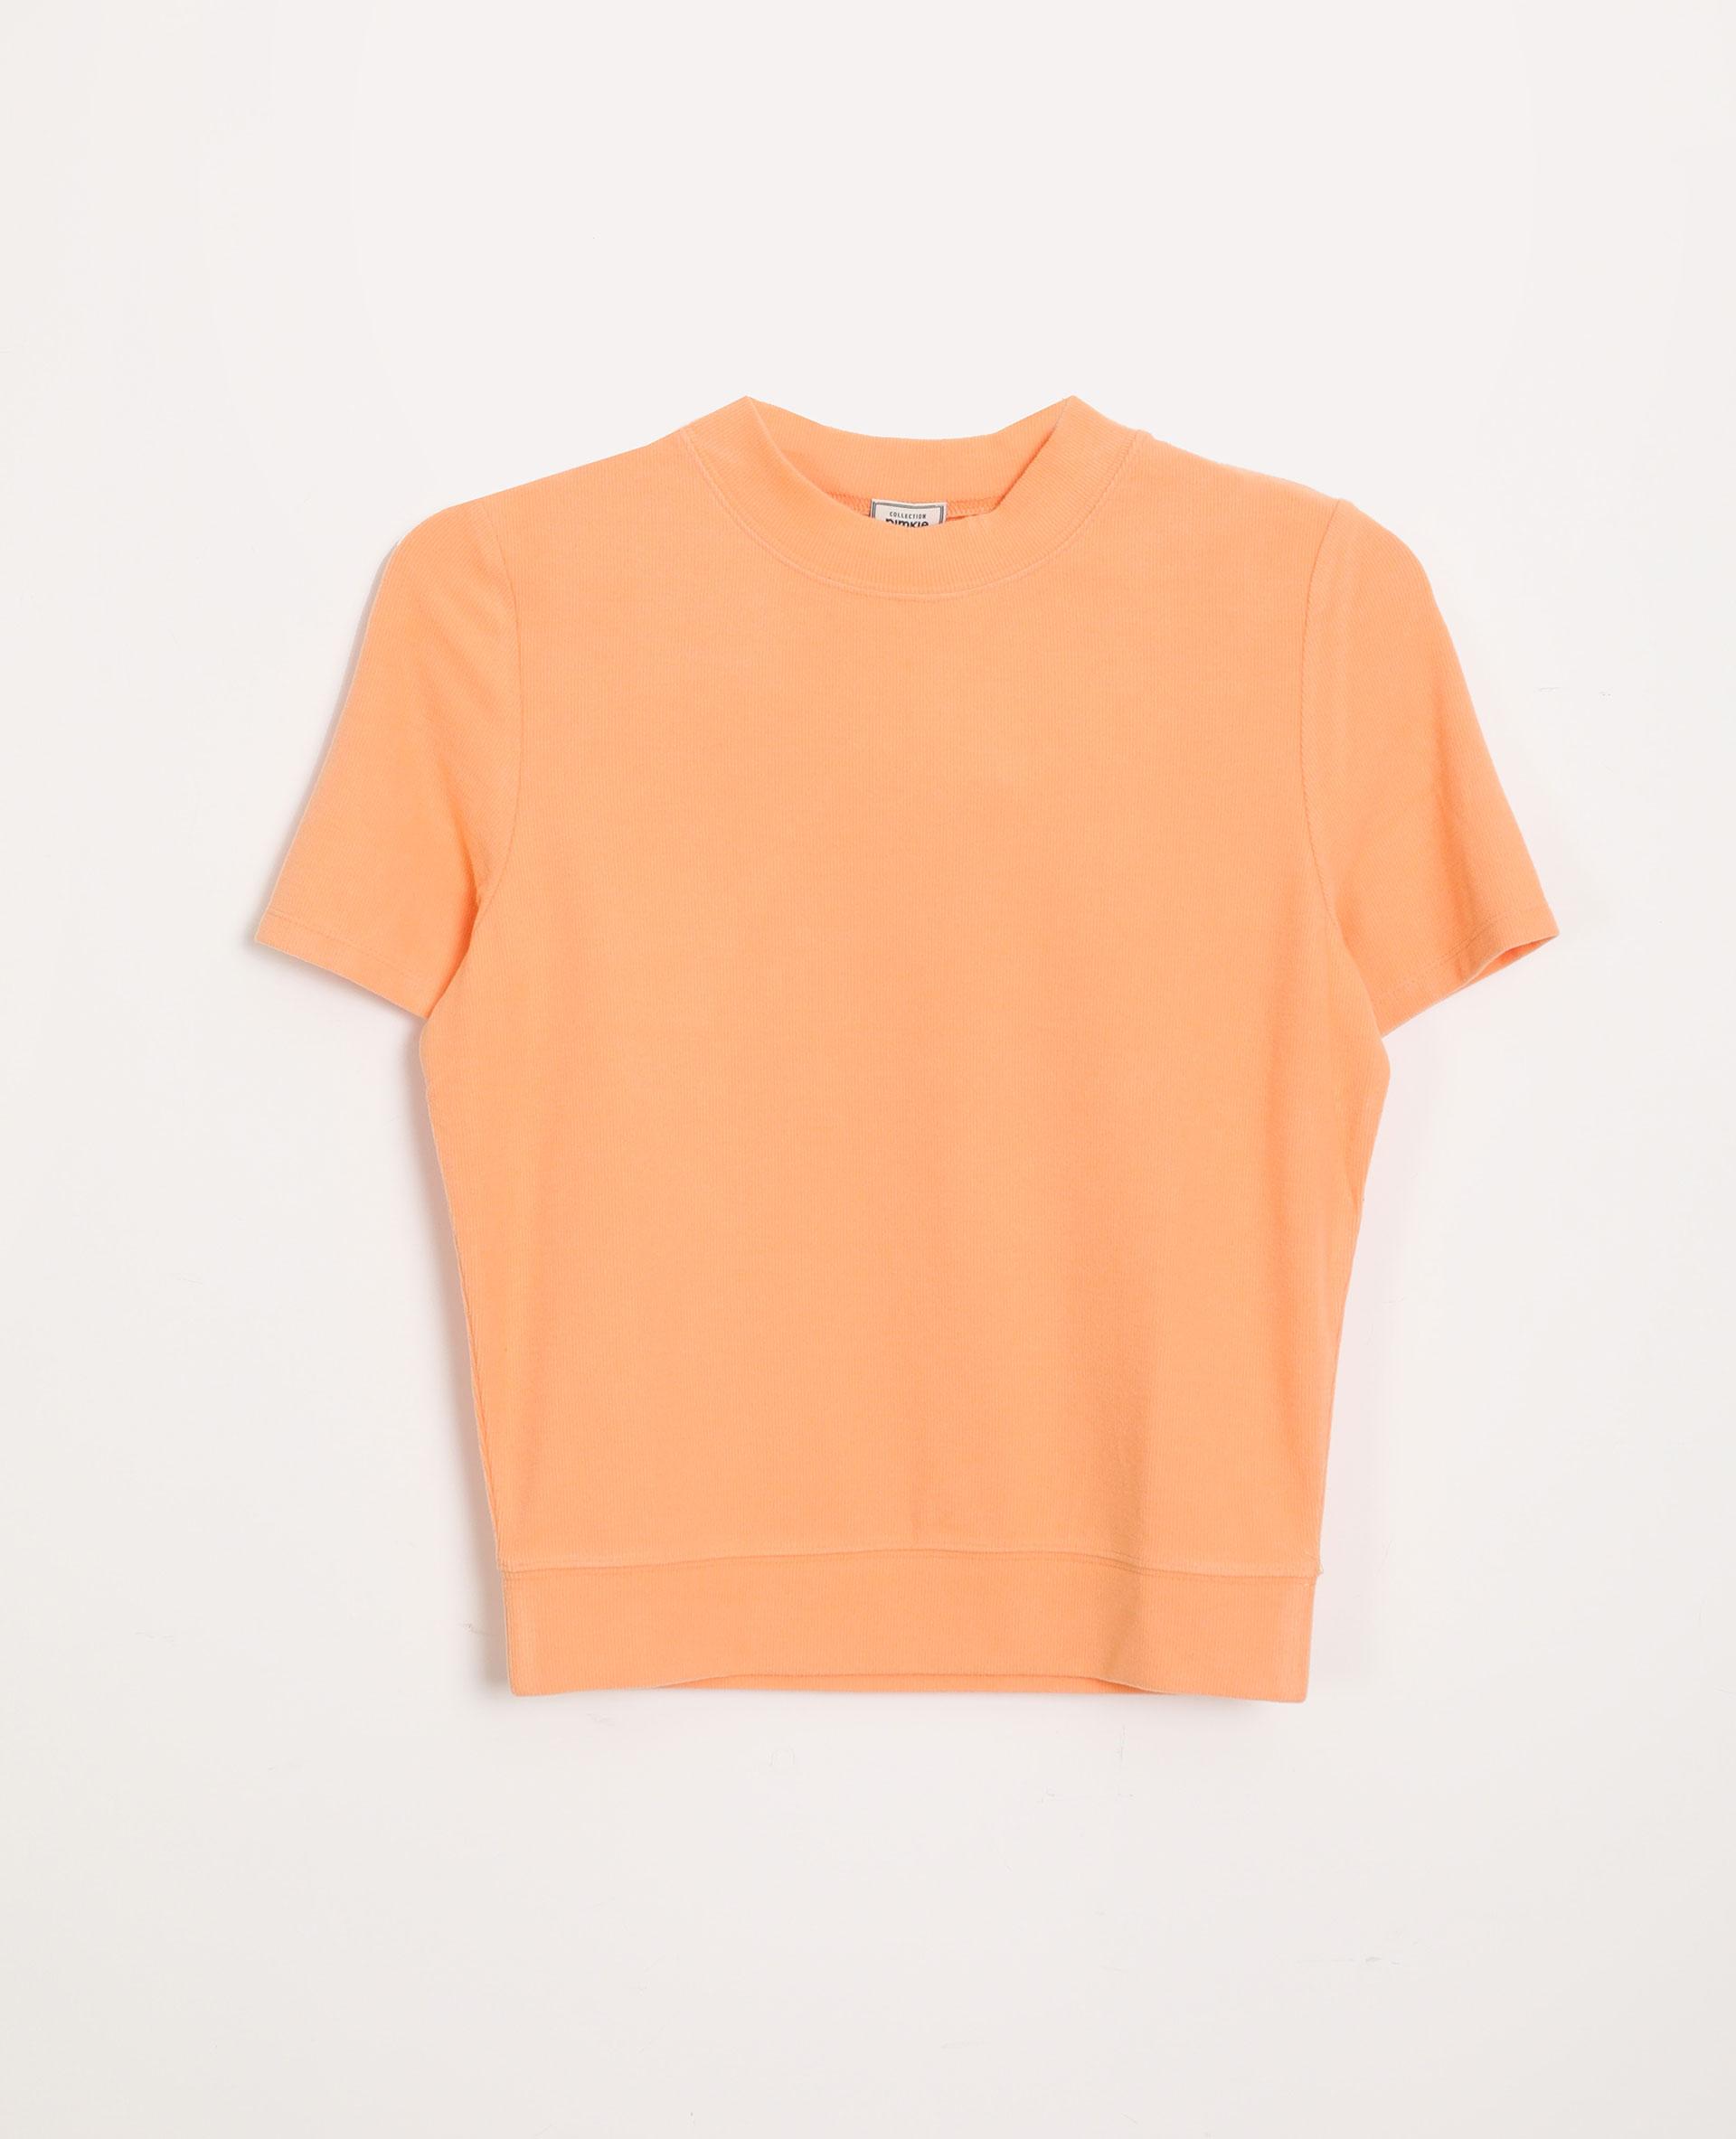 T-shirt doux orange - Pimkie